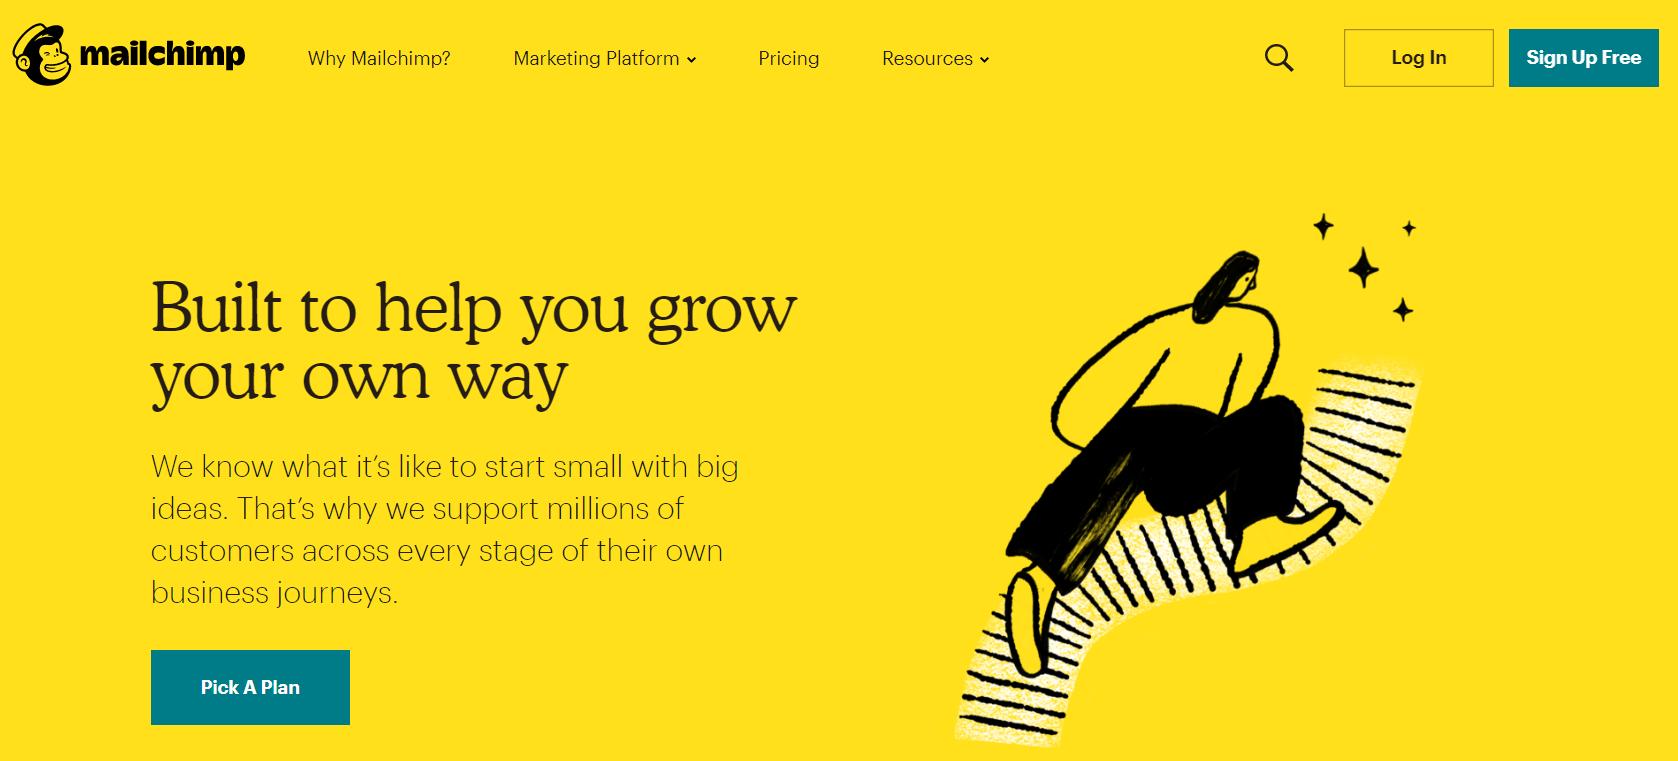 MailChimp branding